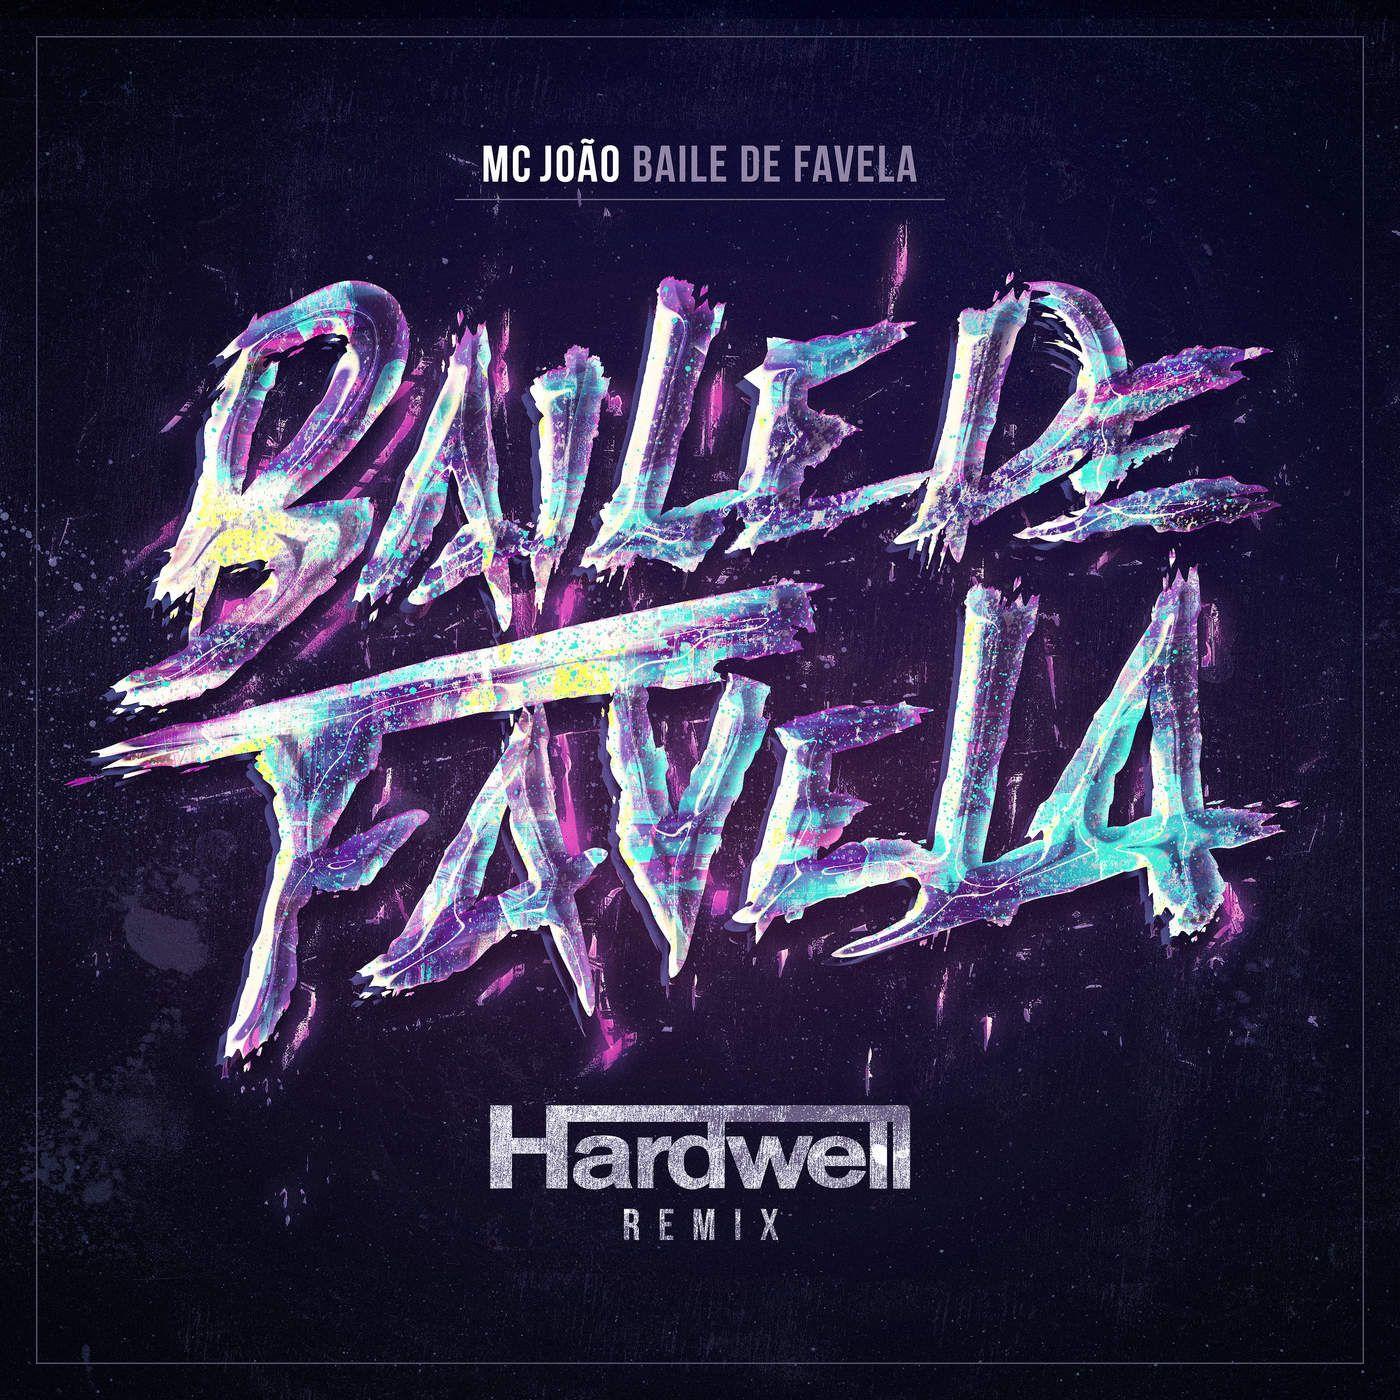 Mc João - Baile de Favela (Hardwell Radio Edit) - Single [iTunes Plus AAC M4A] (2016)  Download: http://dwntoxix.blogspot.com/2016/05/mc-joao-baile-de-favela-hardwell-radio.html